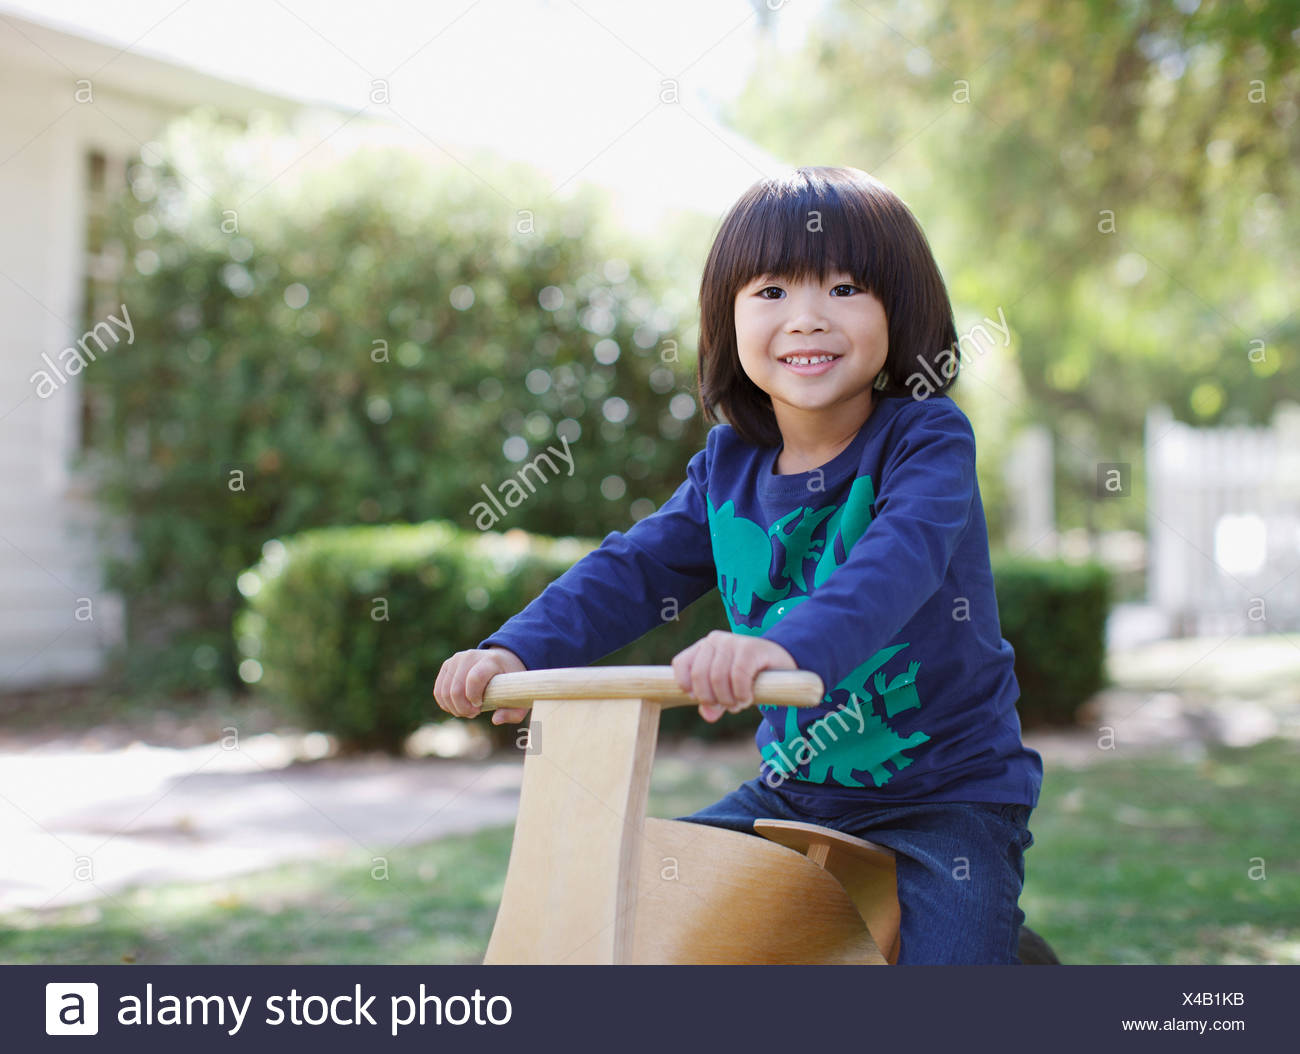 4-5 años,activo,asiáticos,patio,BOY,boys,California,ropa casual,infancia,color image,día,elementary Imagen De Stock